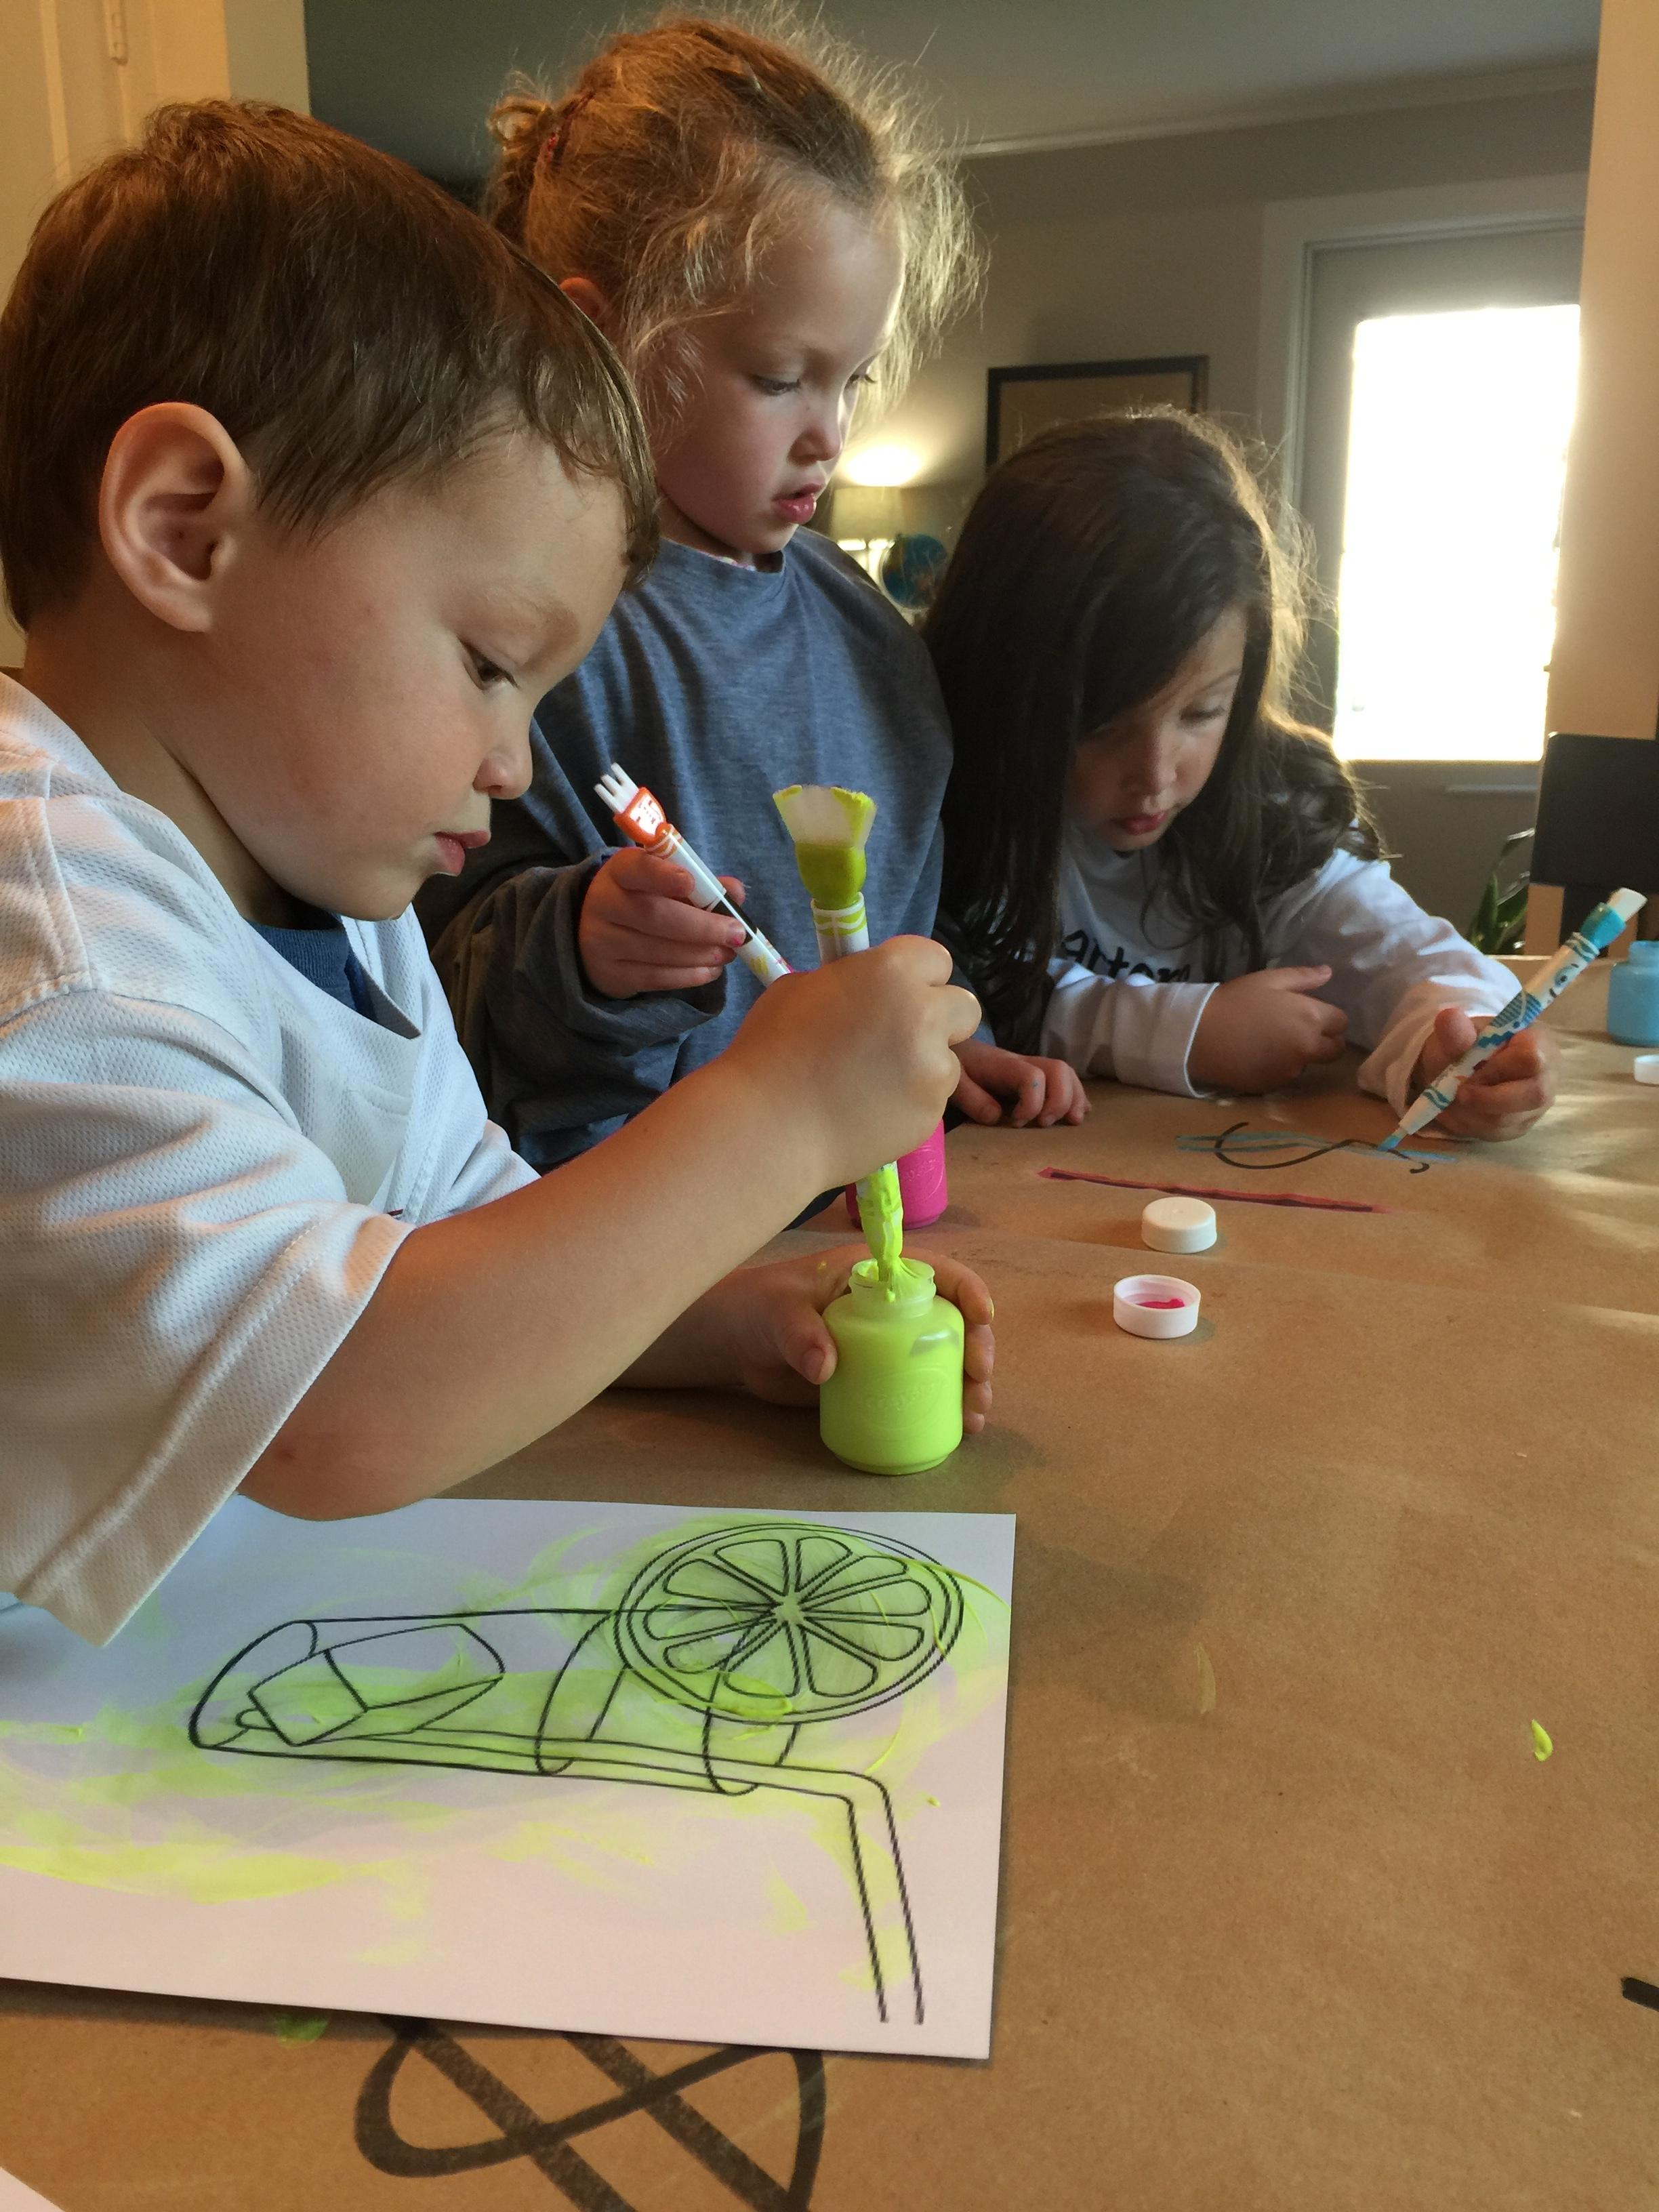 kids making sign for lemonade stand, Robin Camarote